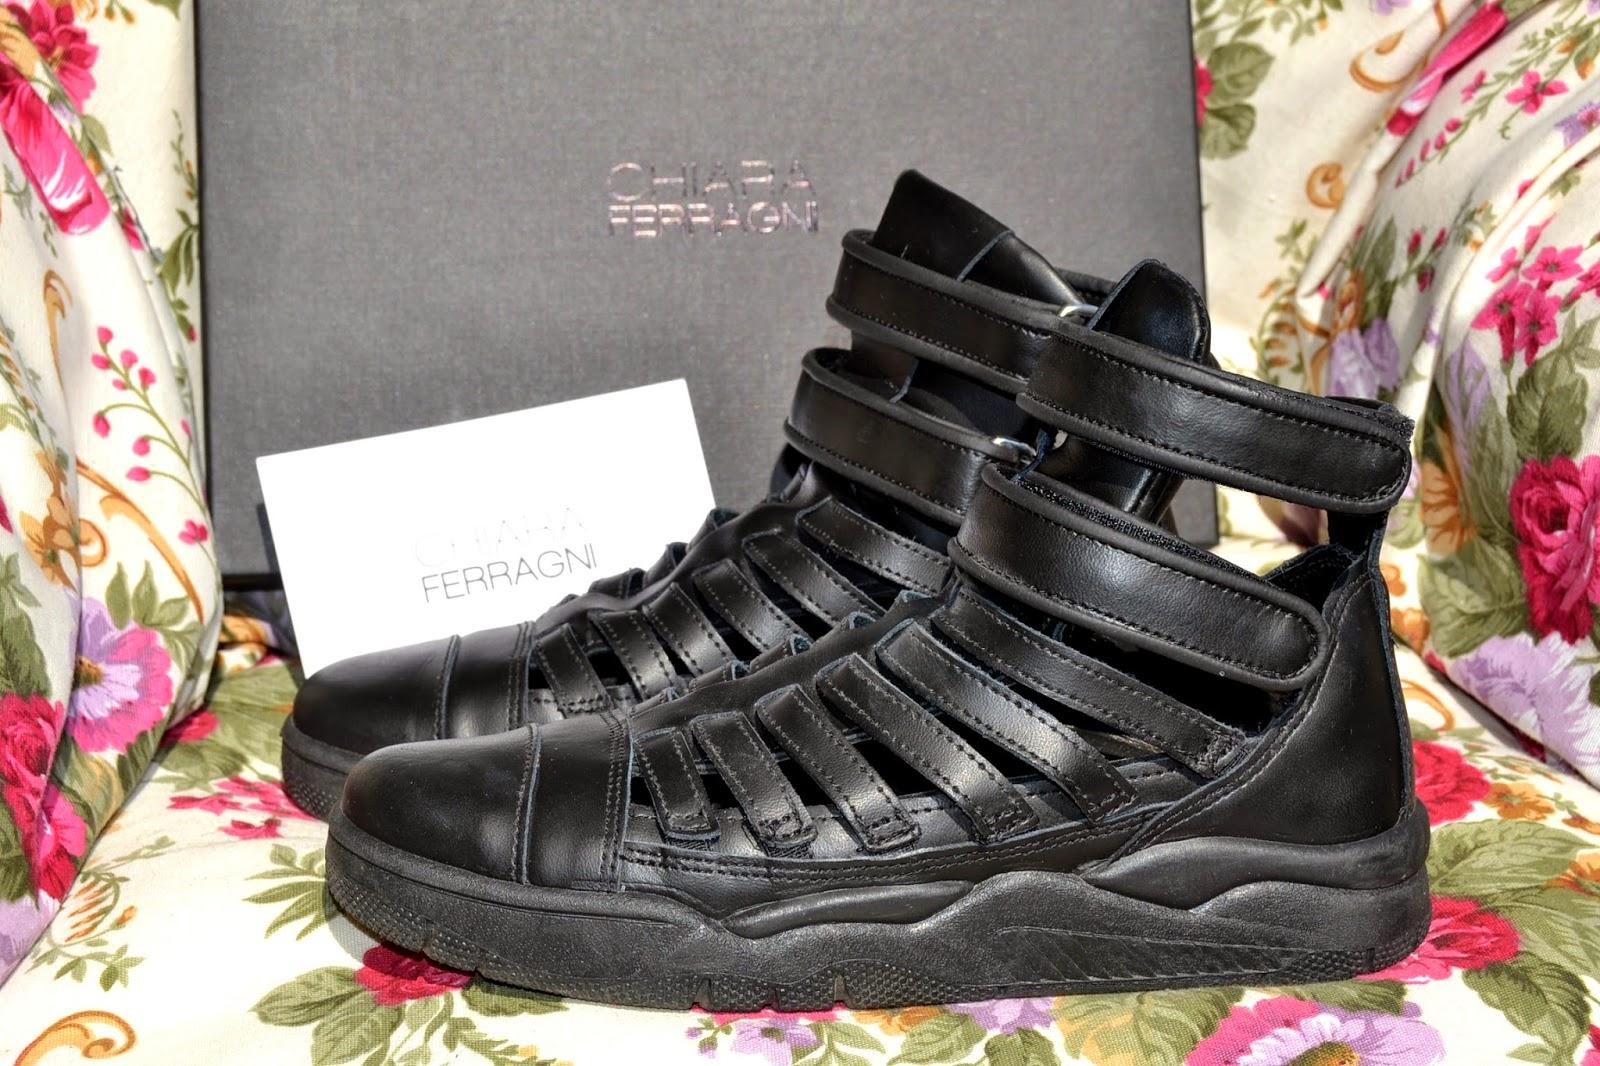 http://www.syriouslyinfashion.com/2015/04/chiara-ferragni-collection-drew-sneakers.html